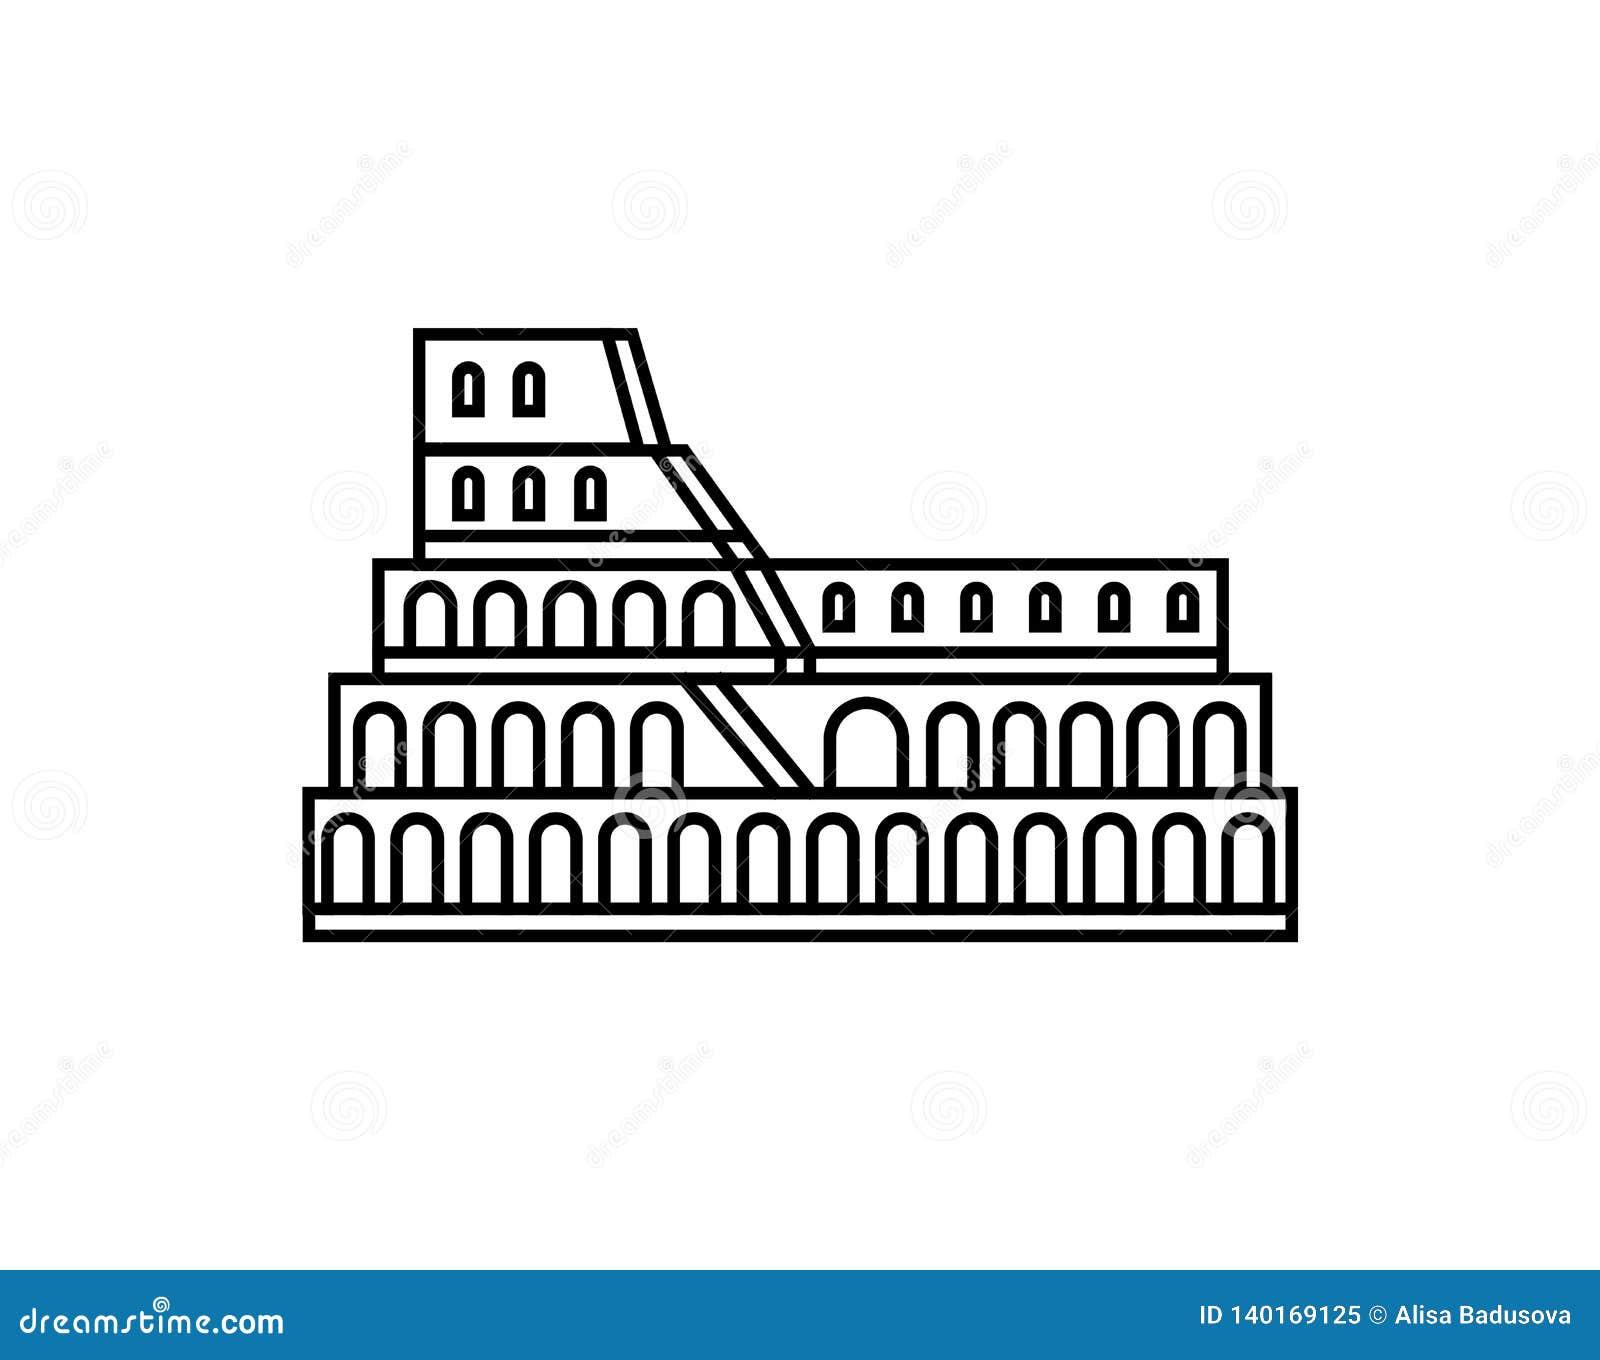 Coliseum vector icon. Italian symbol logo illustration.